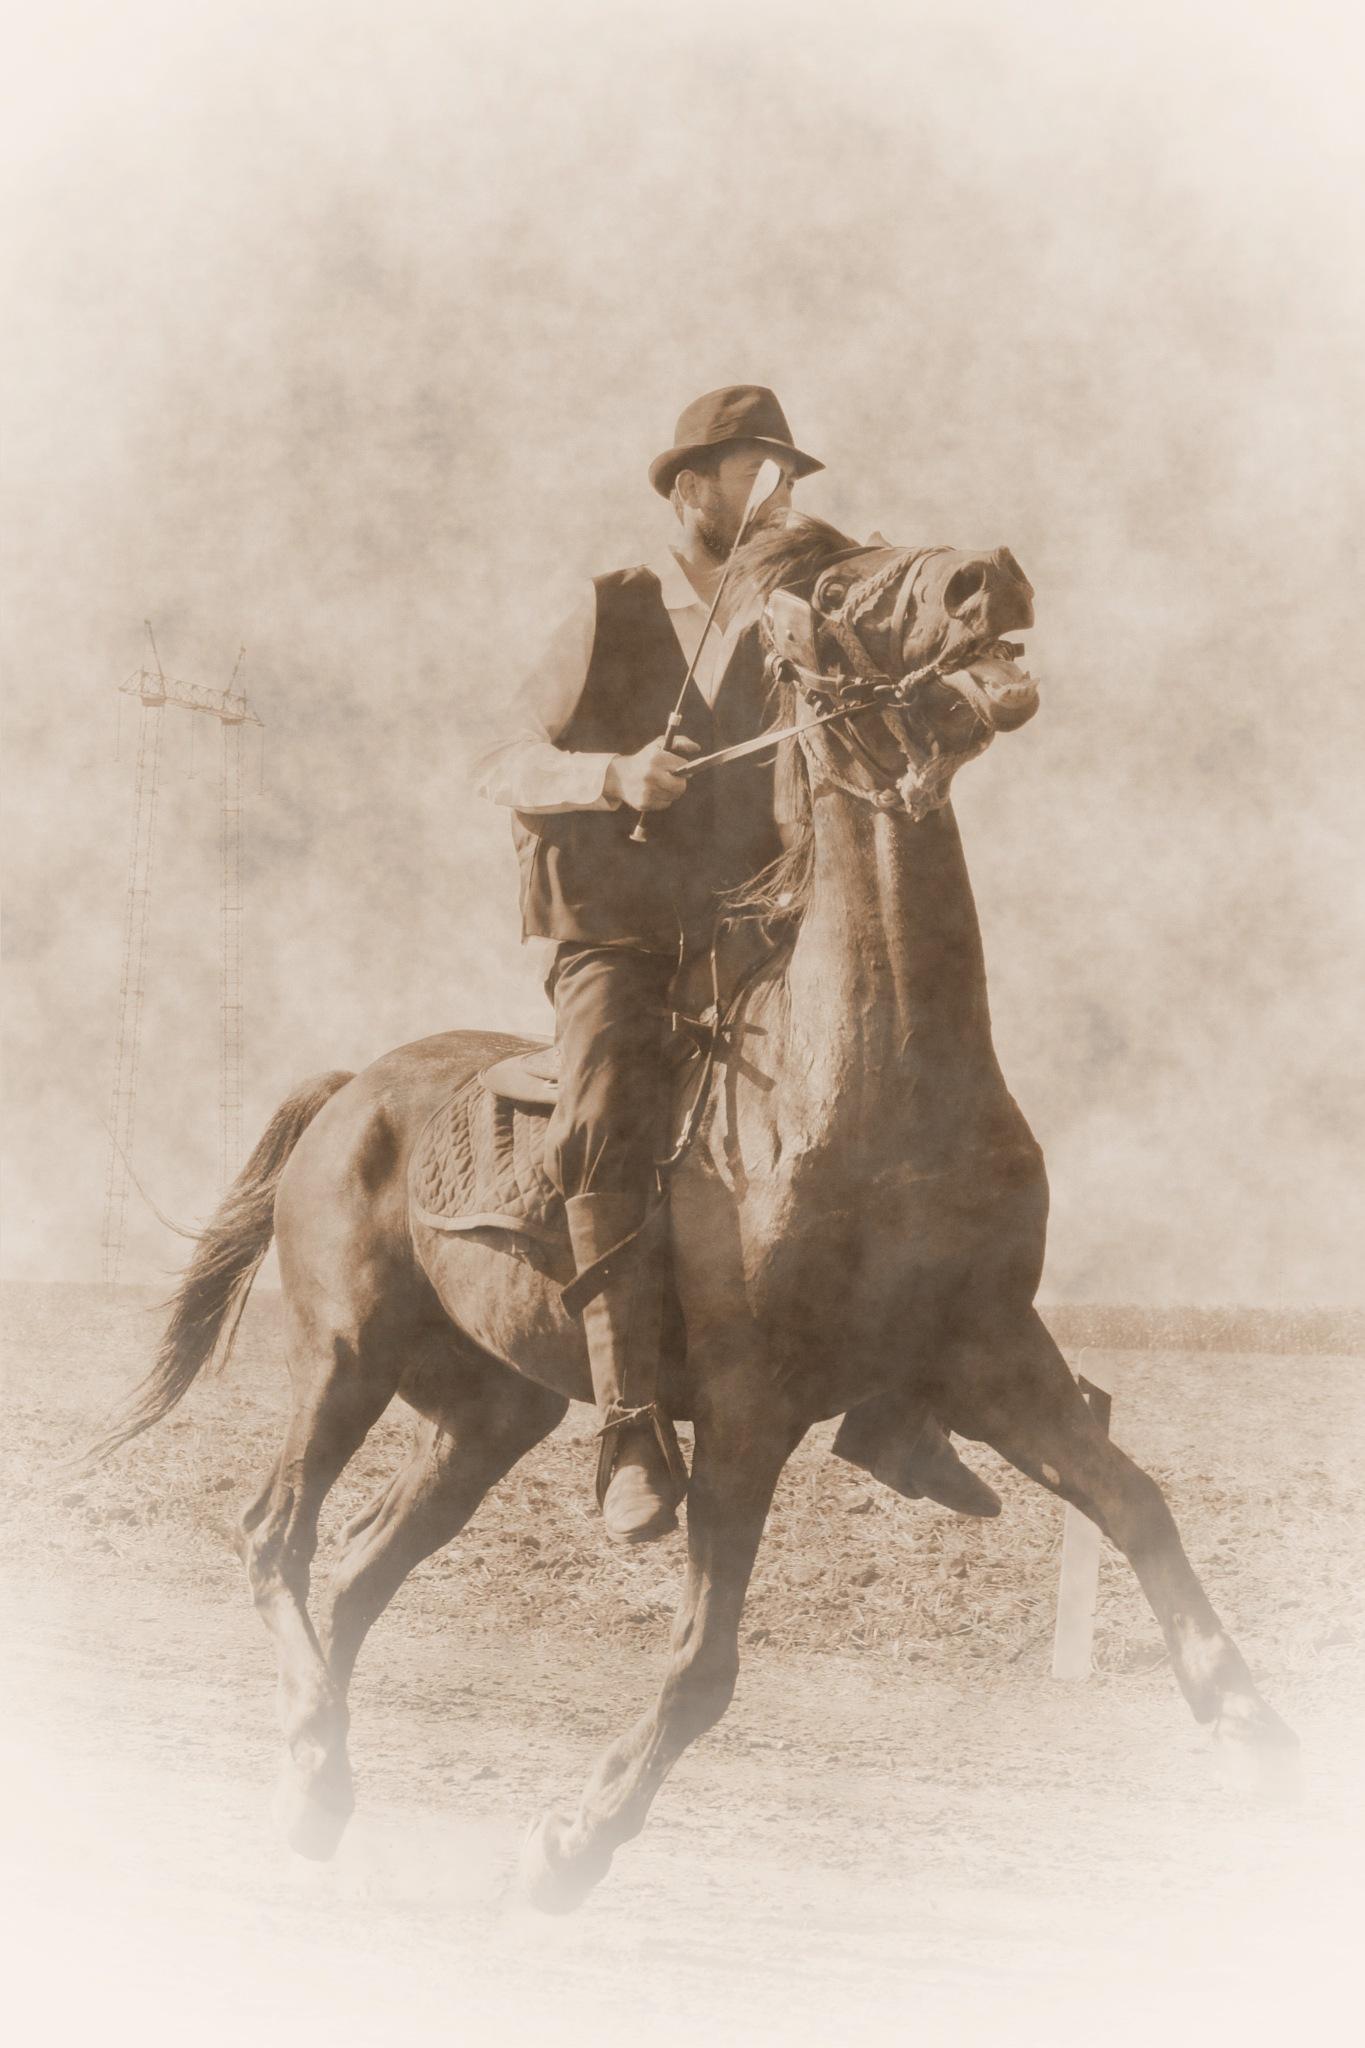 Horseman by Dragan Lendjel Lenjo